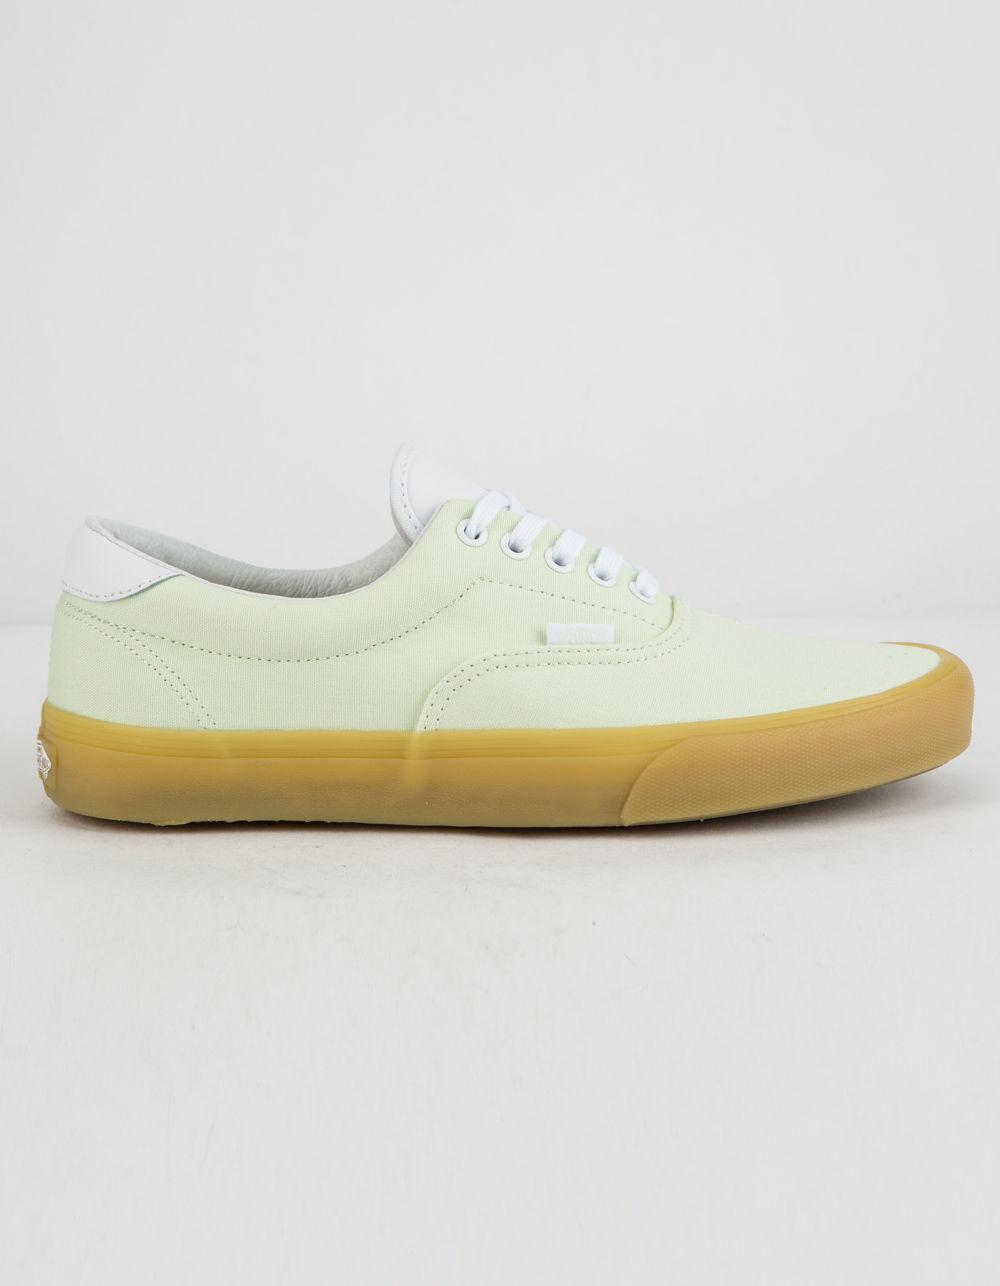 Lyst - Vans Double Light Gum Era 59 Shoes in Green for Men d5fd3344ec